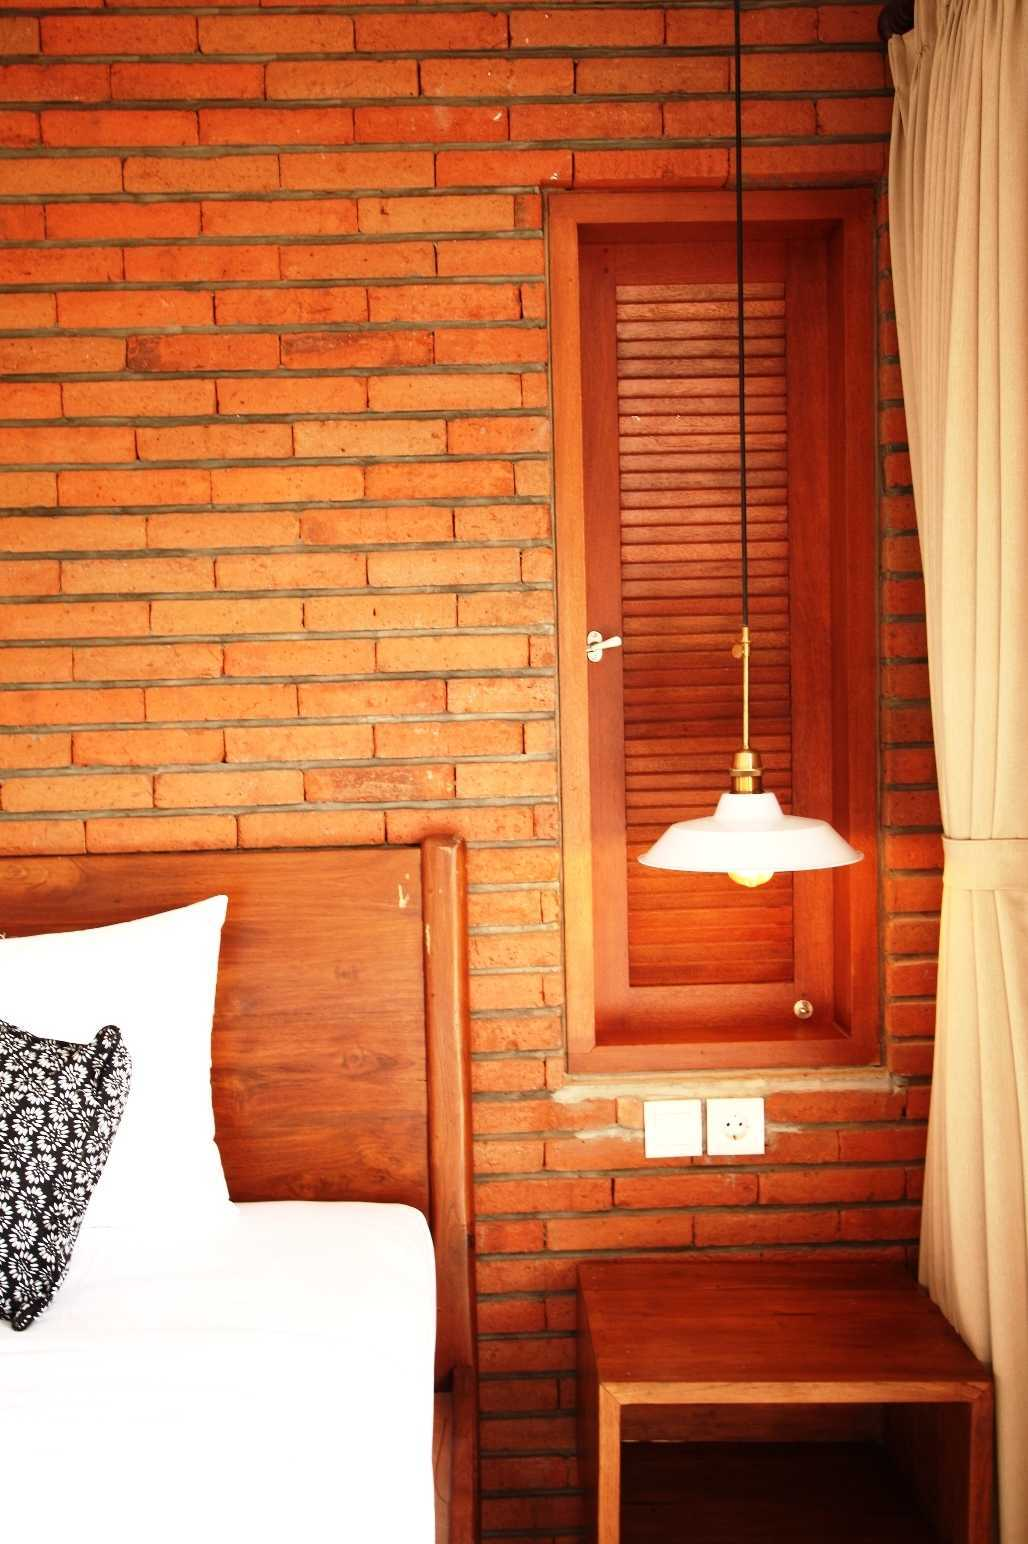 Ddap Architect Kubu Tropis Lodge Accommodation Ubud, Kabupaten Gianyar, Bali, Indonesia Bali Img0708 Tropis  28526